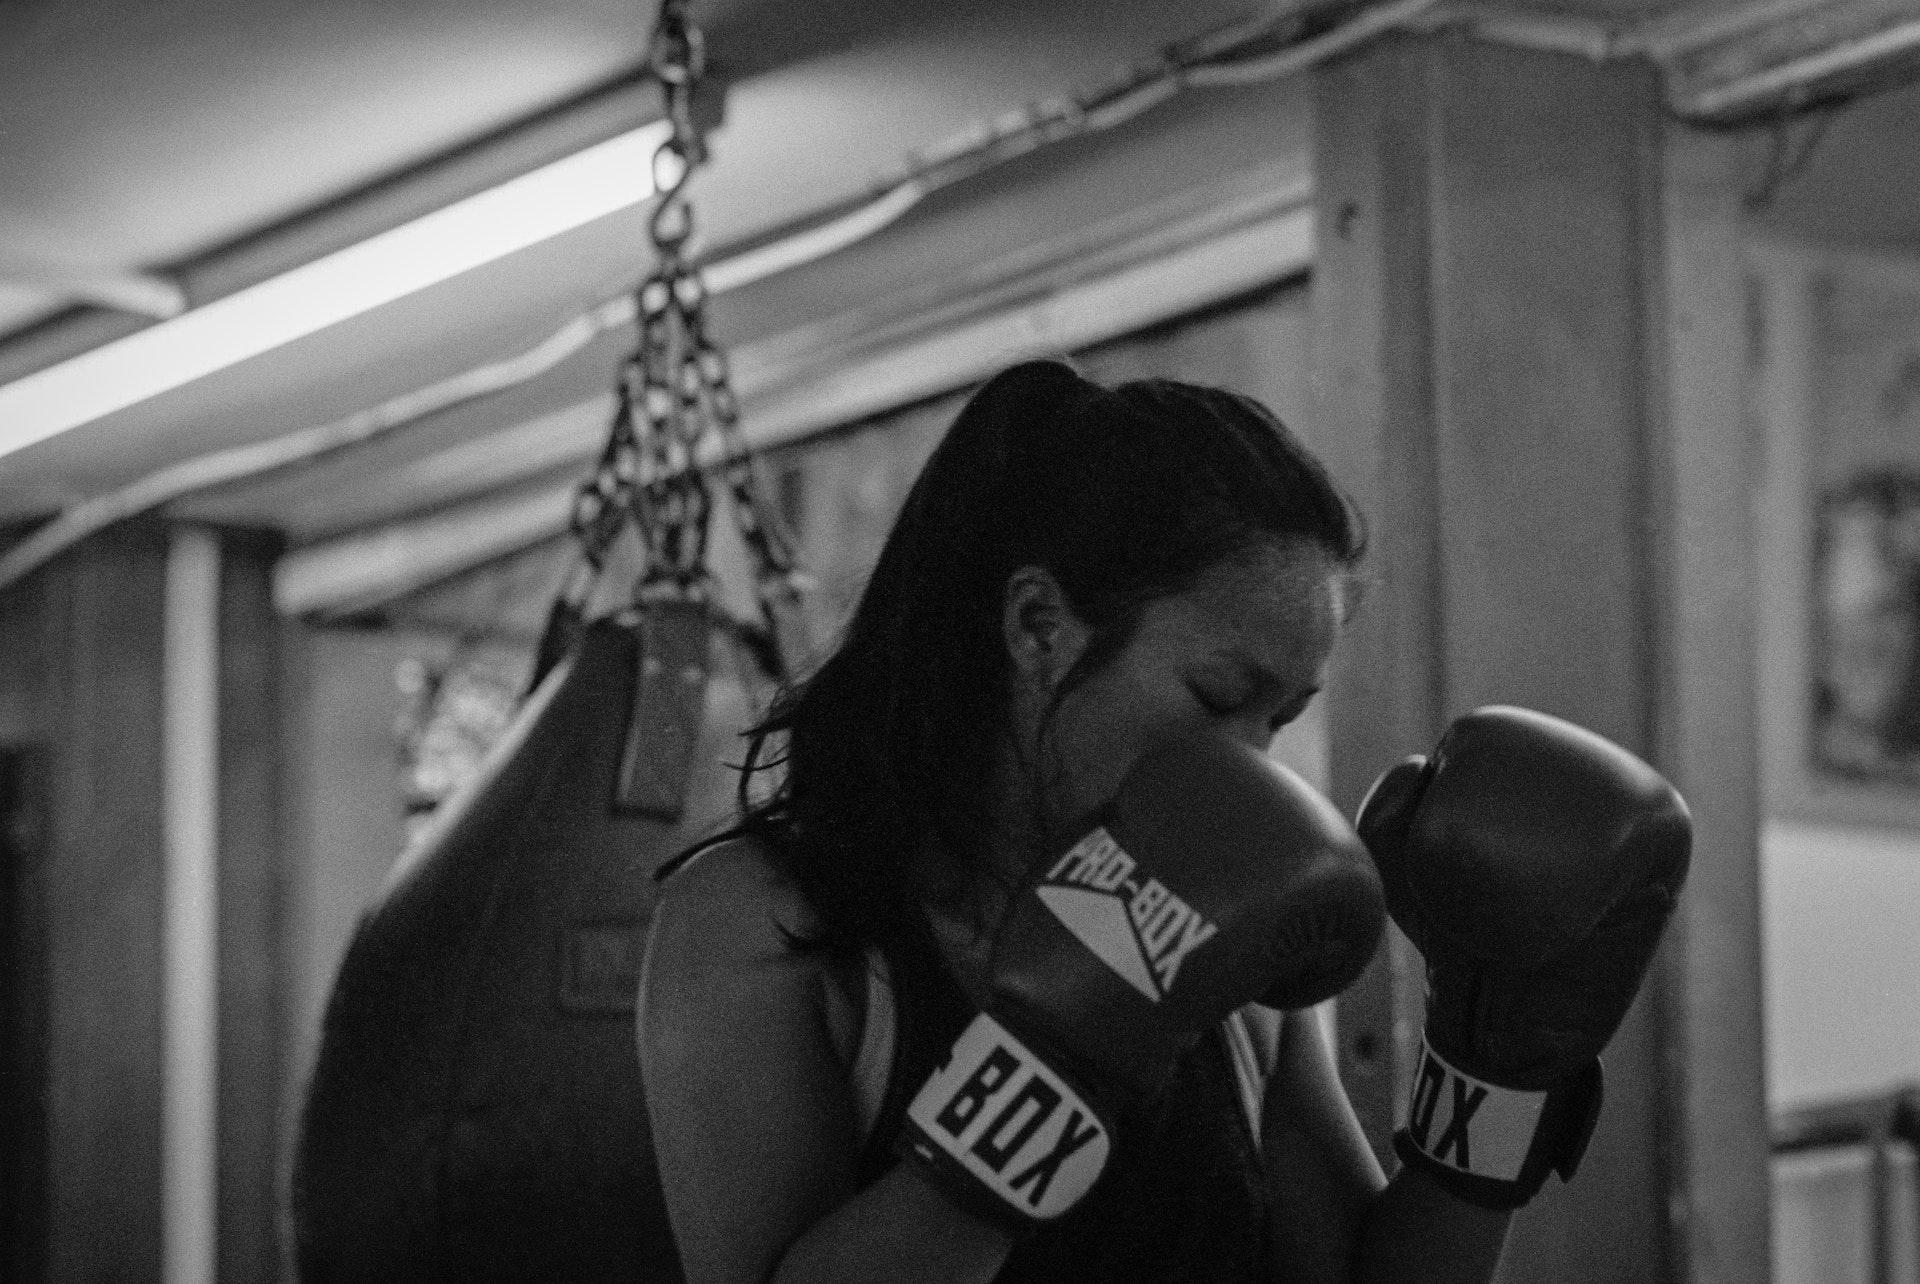 Islington_Boxing_Club-16